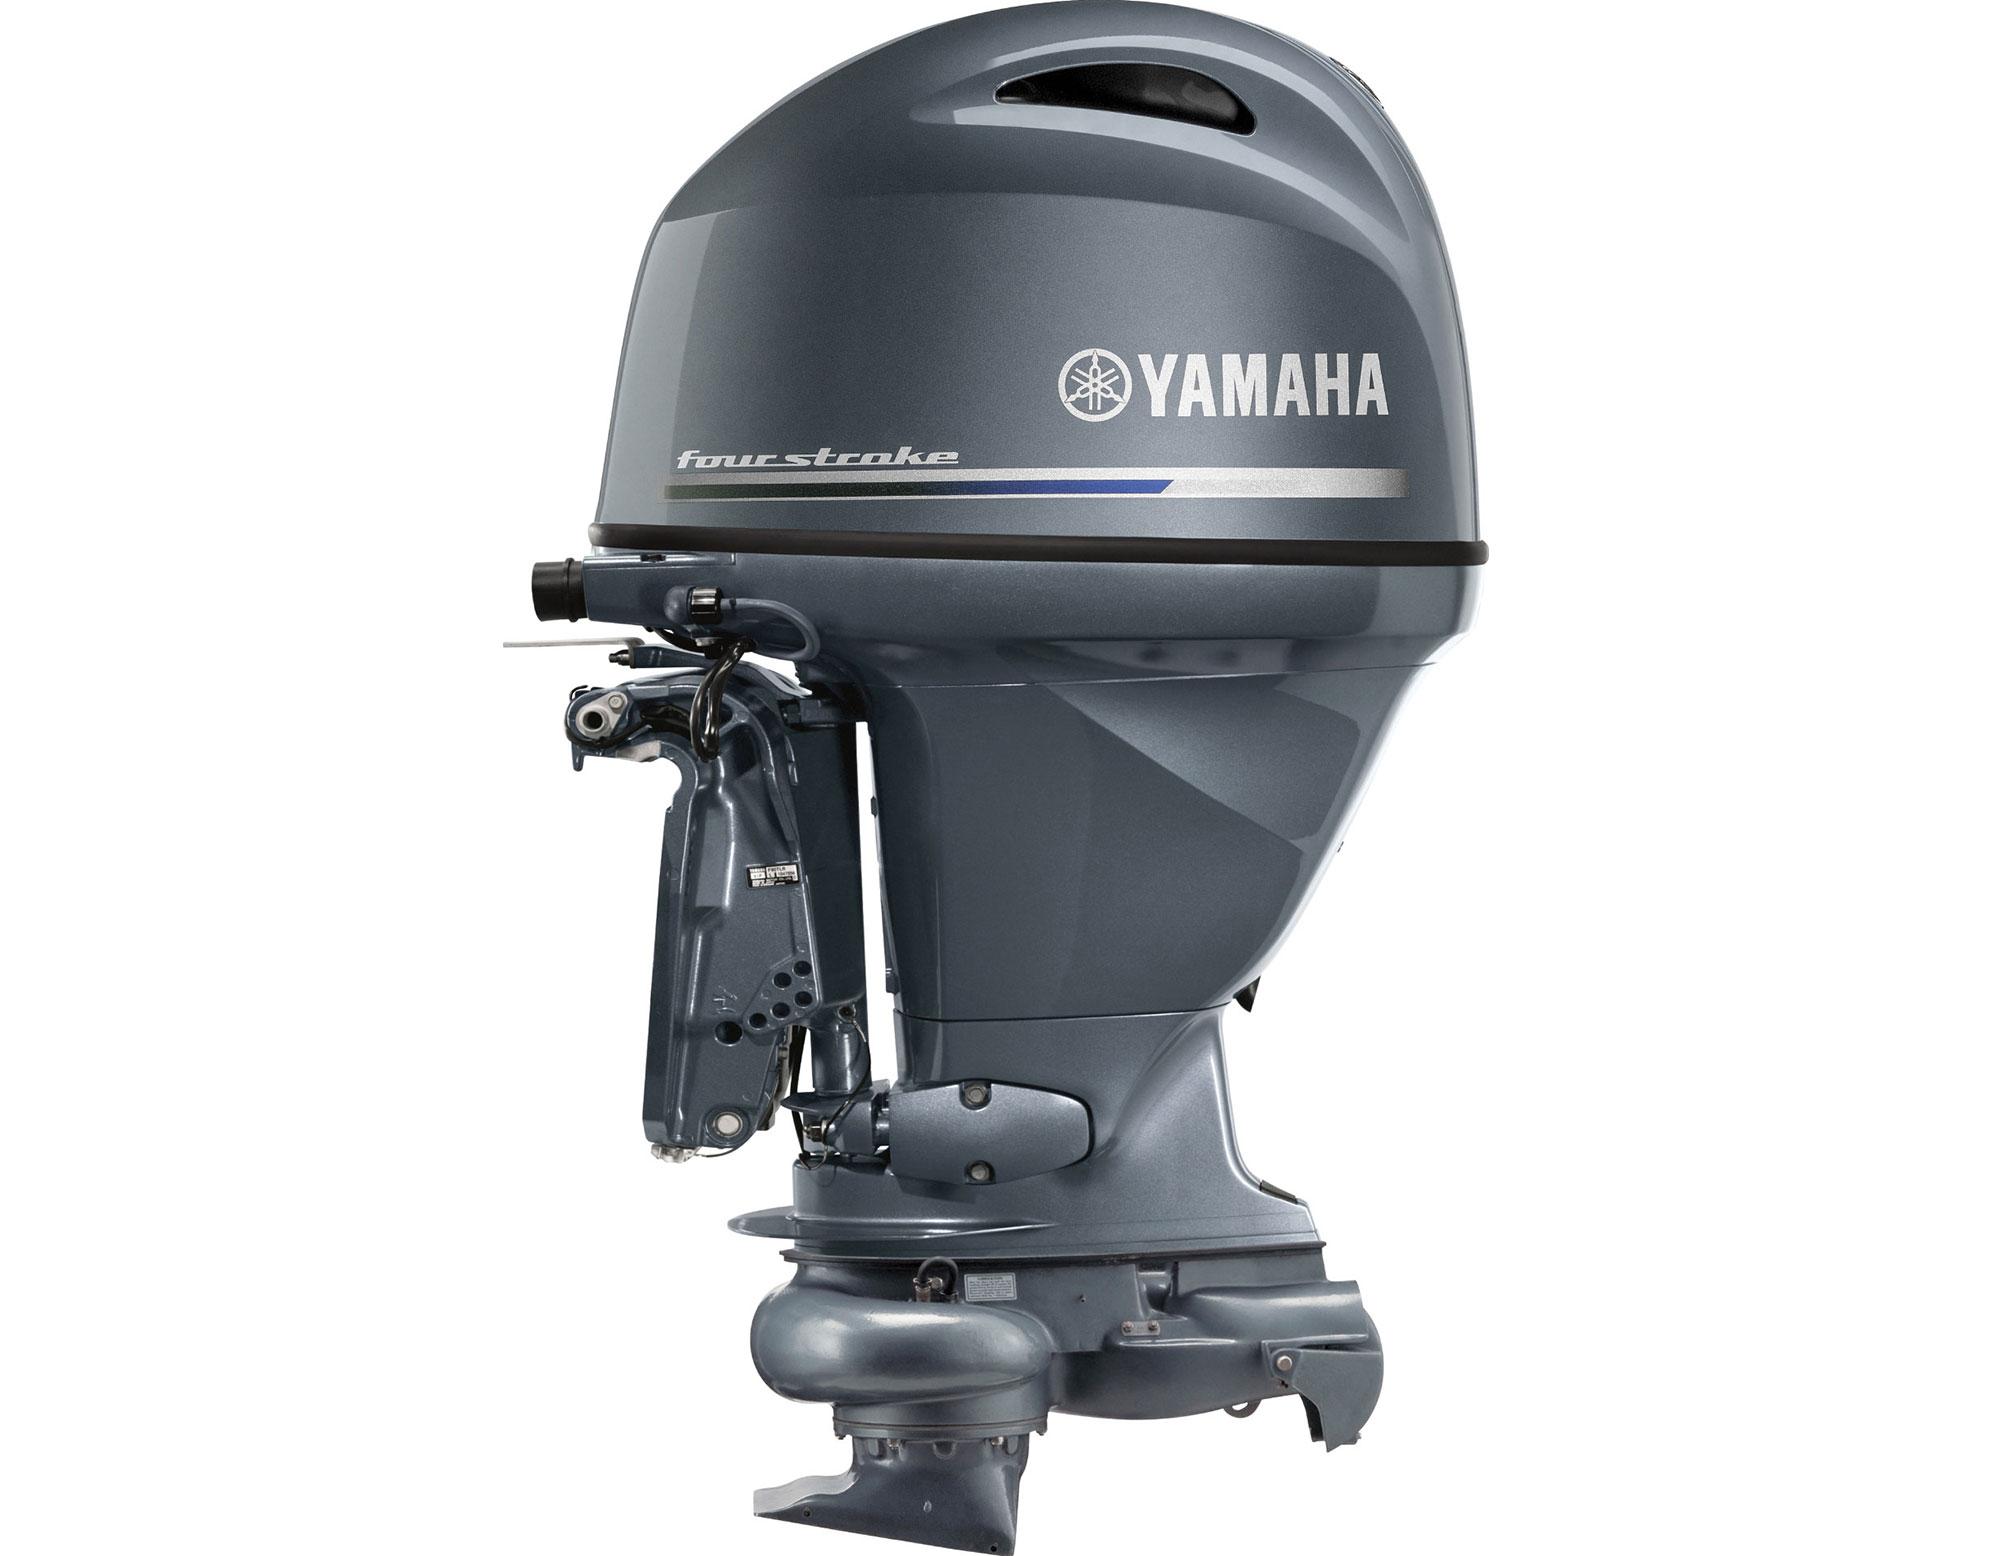 Yamaha F90 JET DRIVE